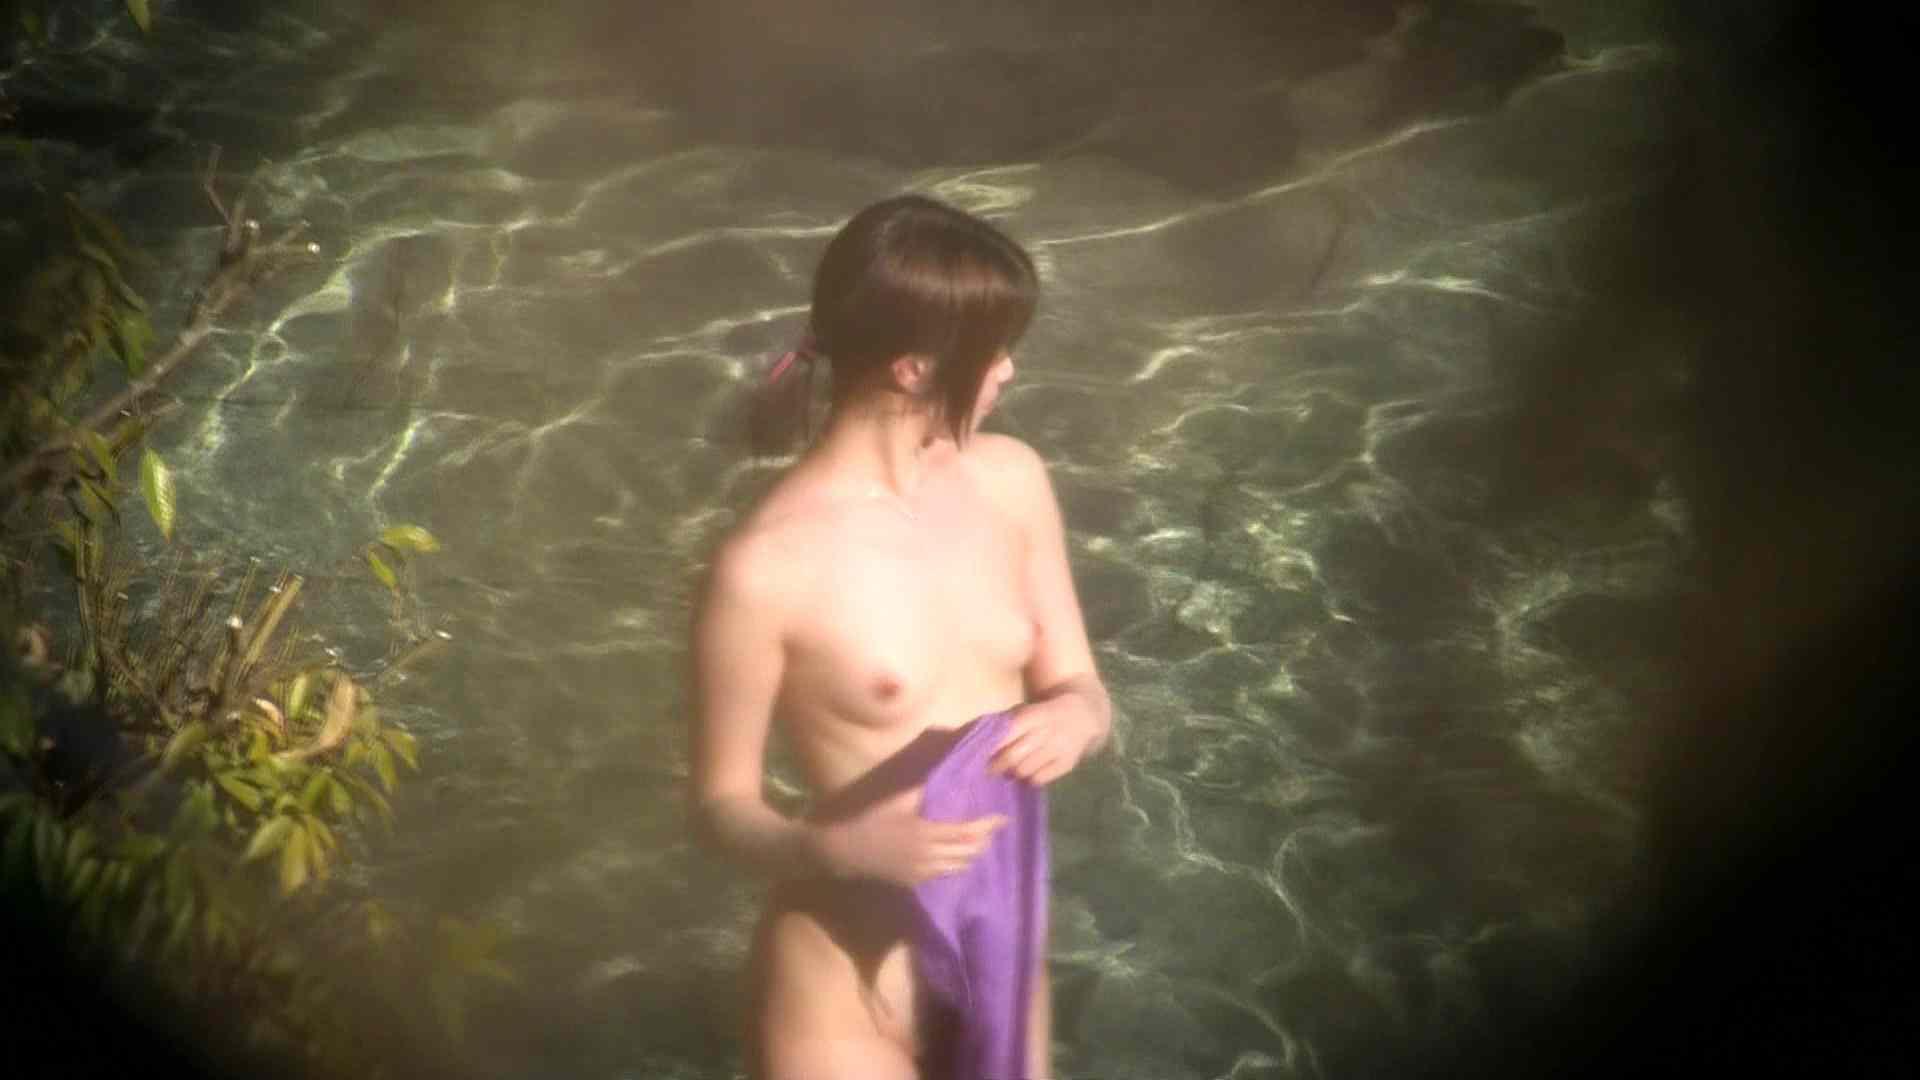 Aquaな露天風呂Vol.698 盗撮 | HなOL  86pic 85